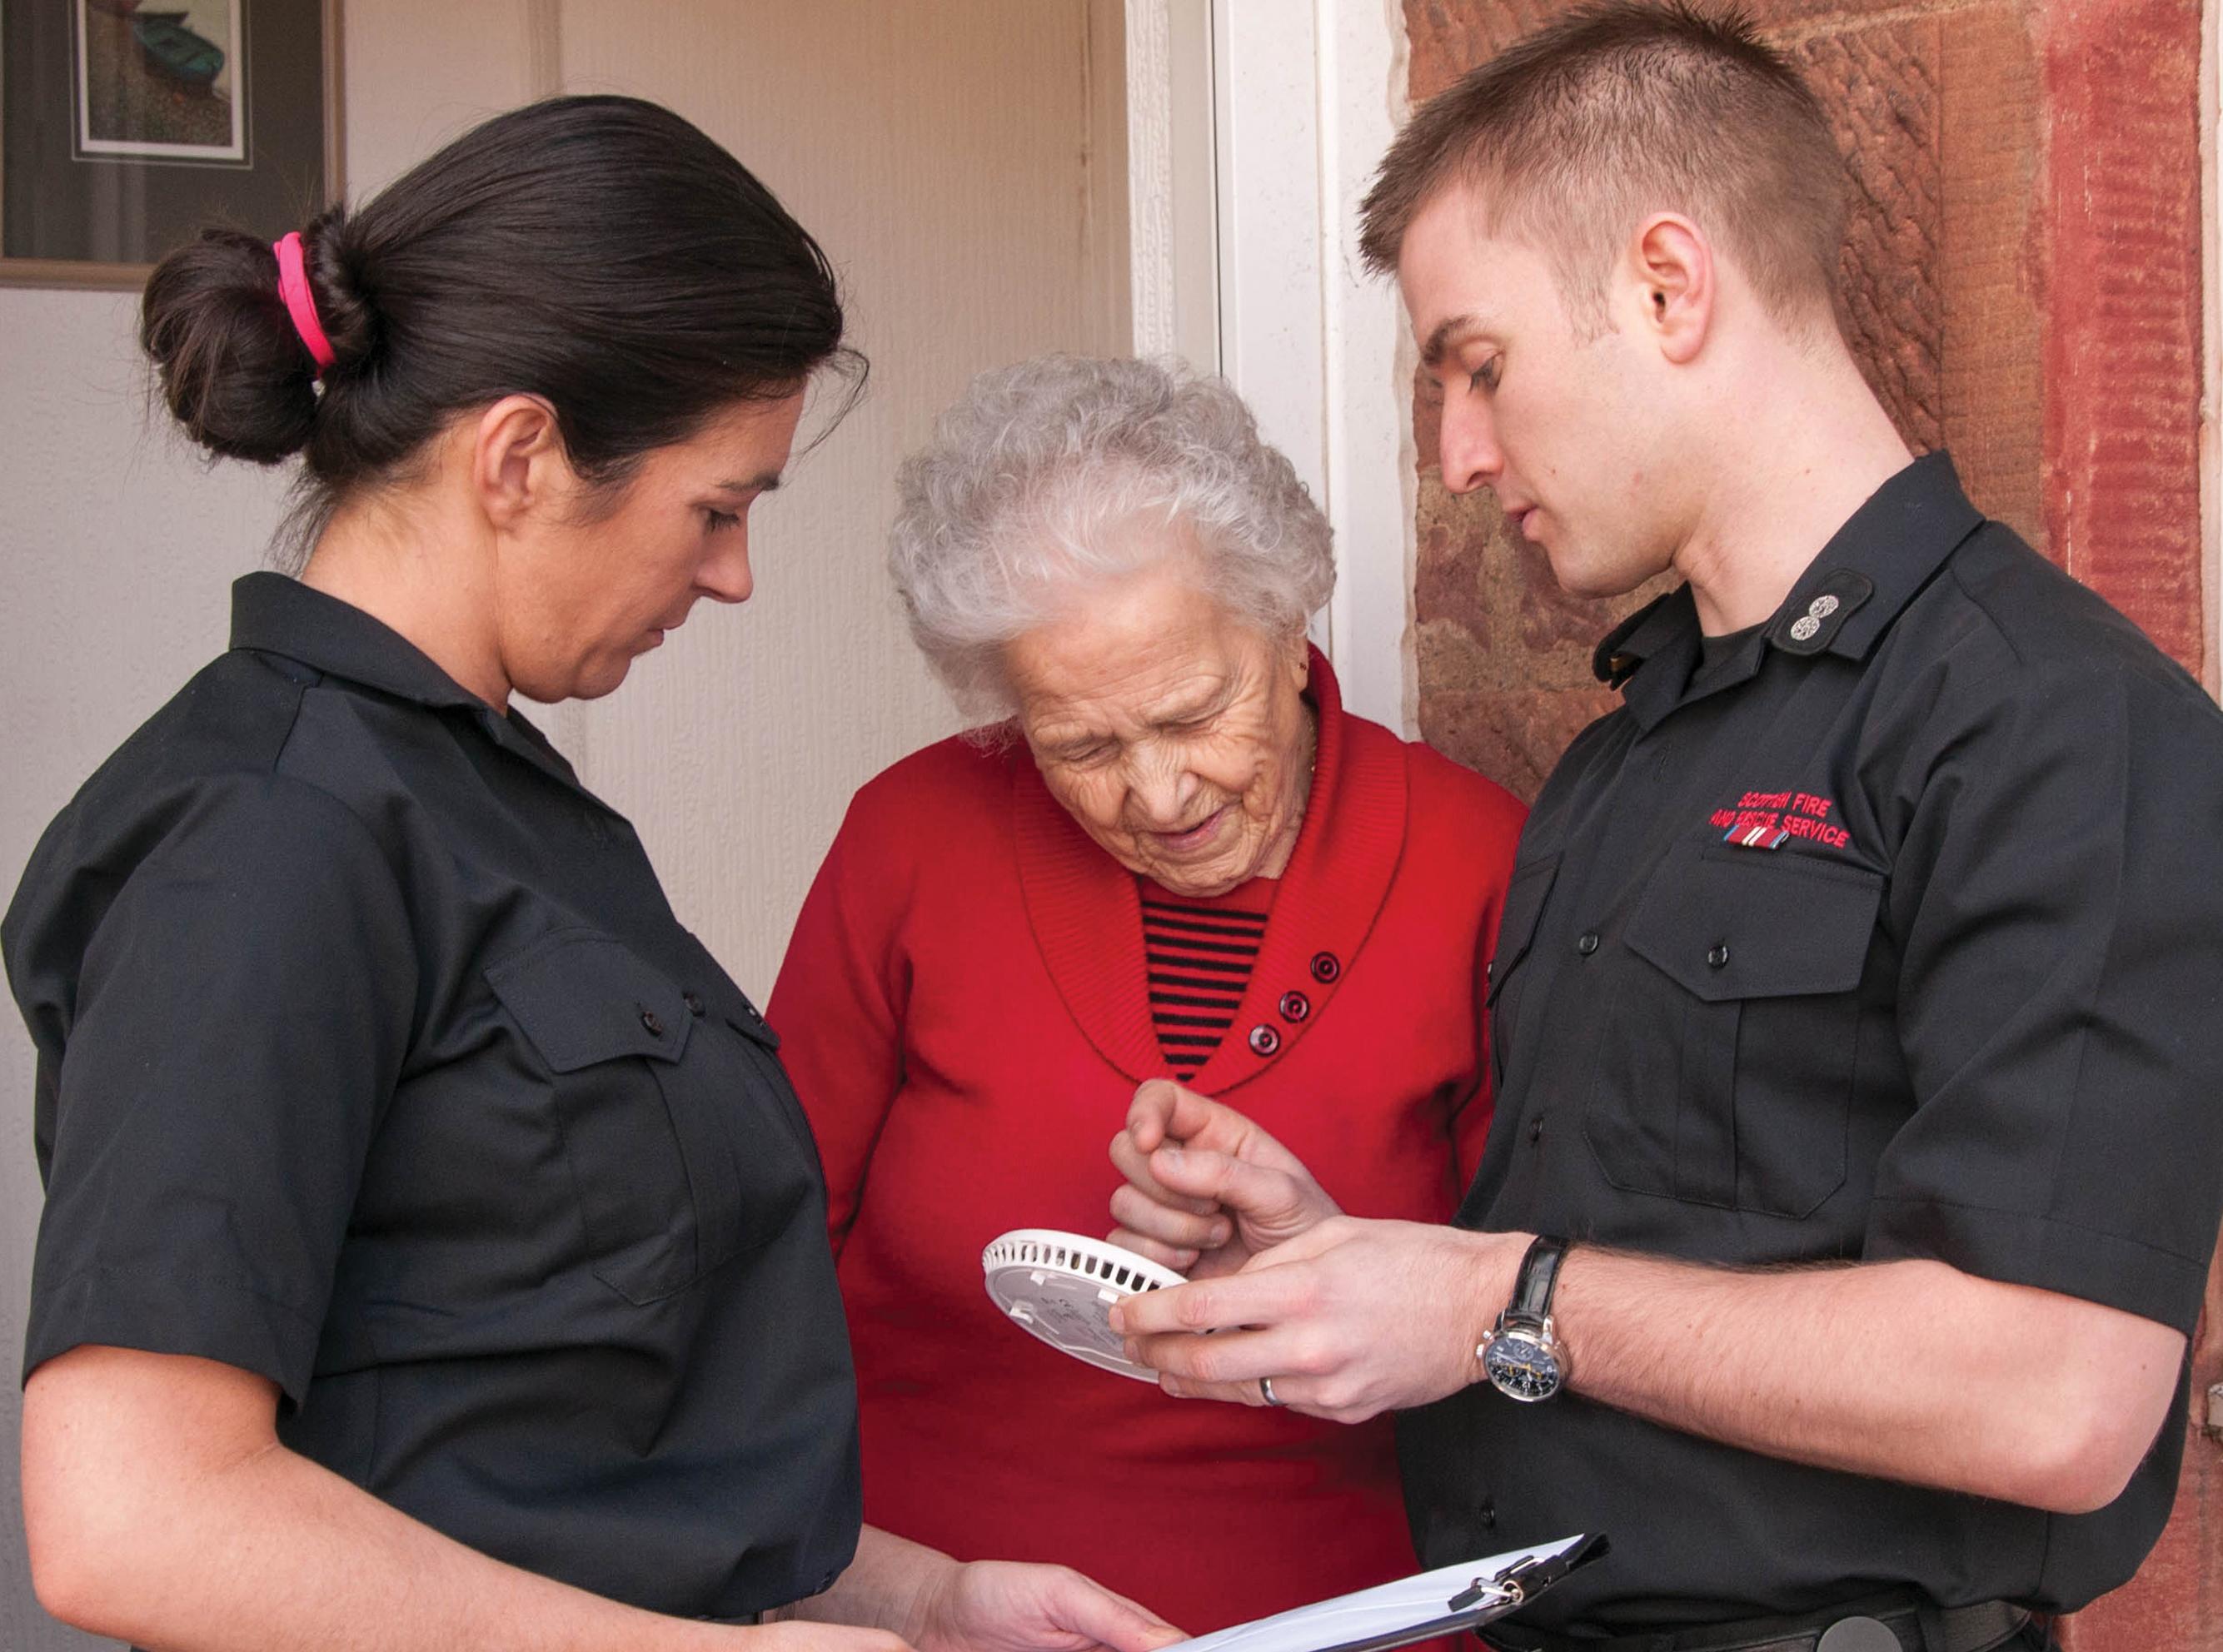 East Dunbartonshire crews are dementia aware